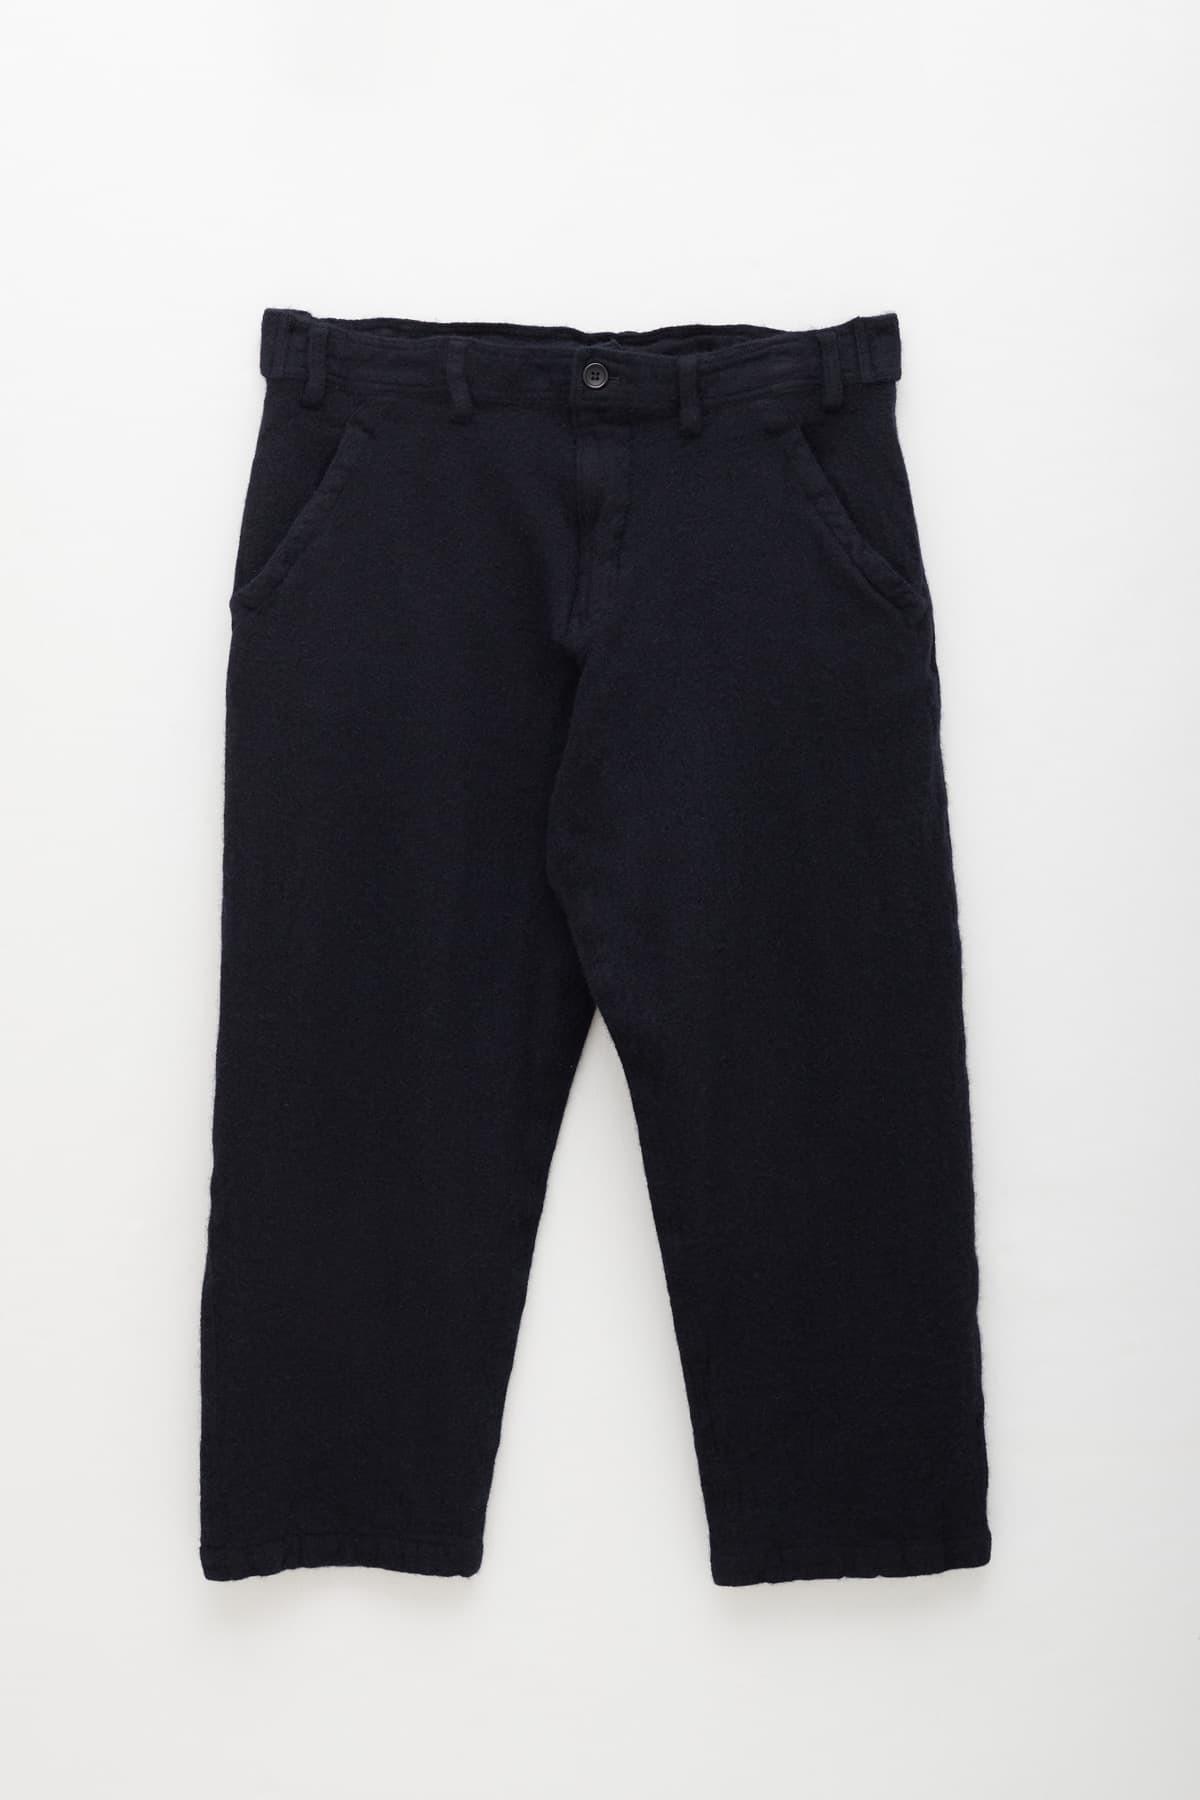 Aries Navy Classic Temple Sweatshirt